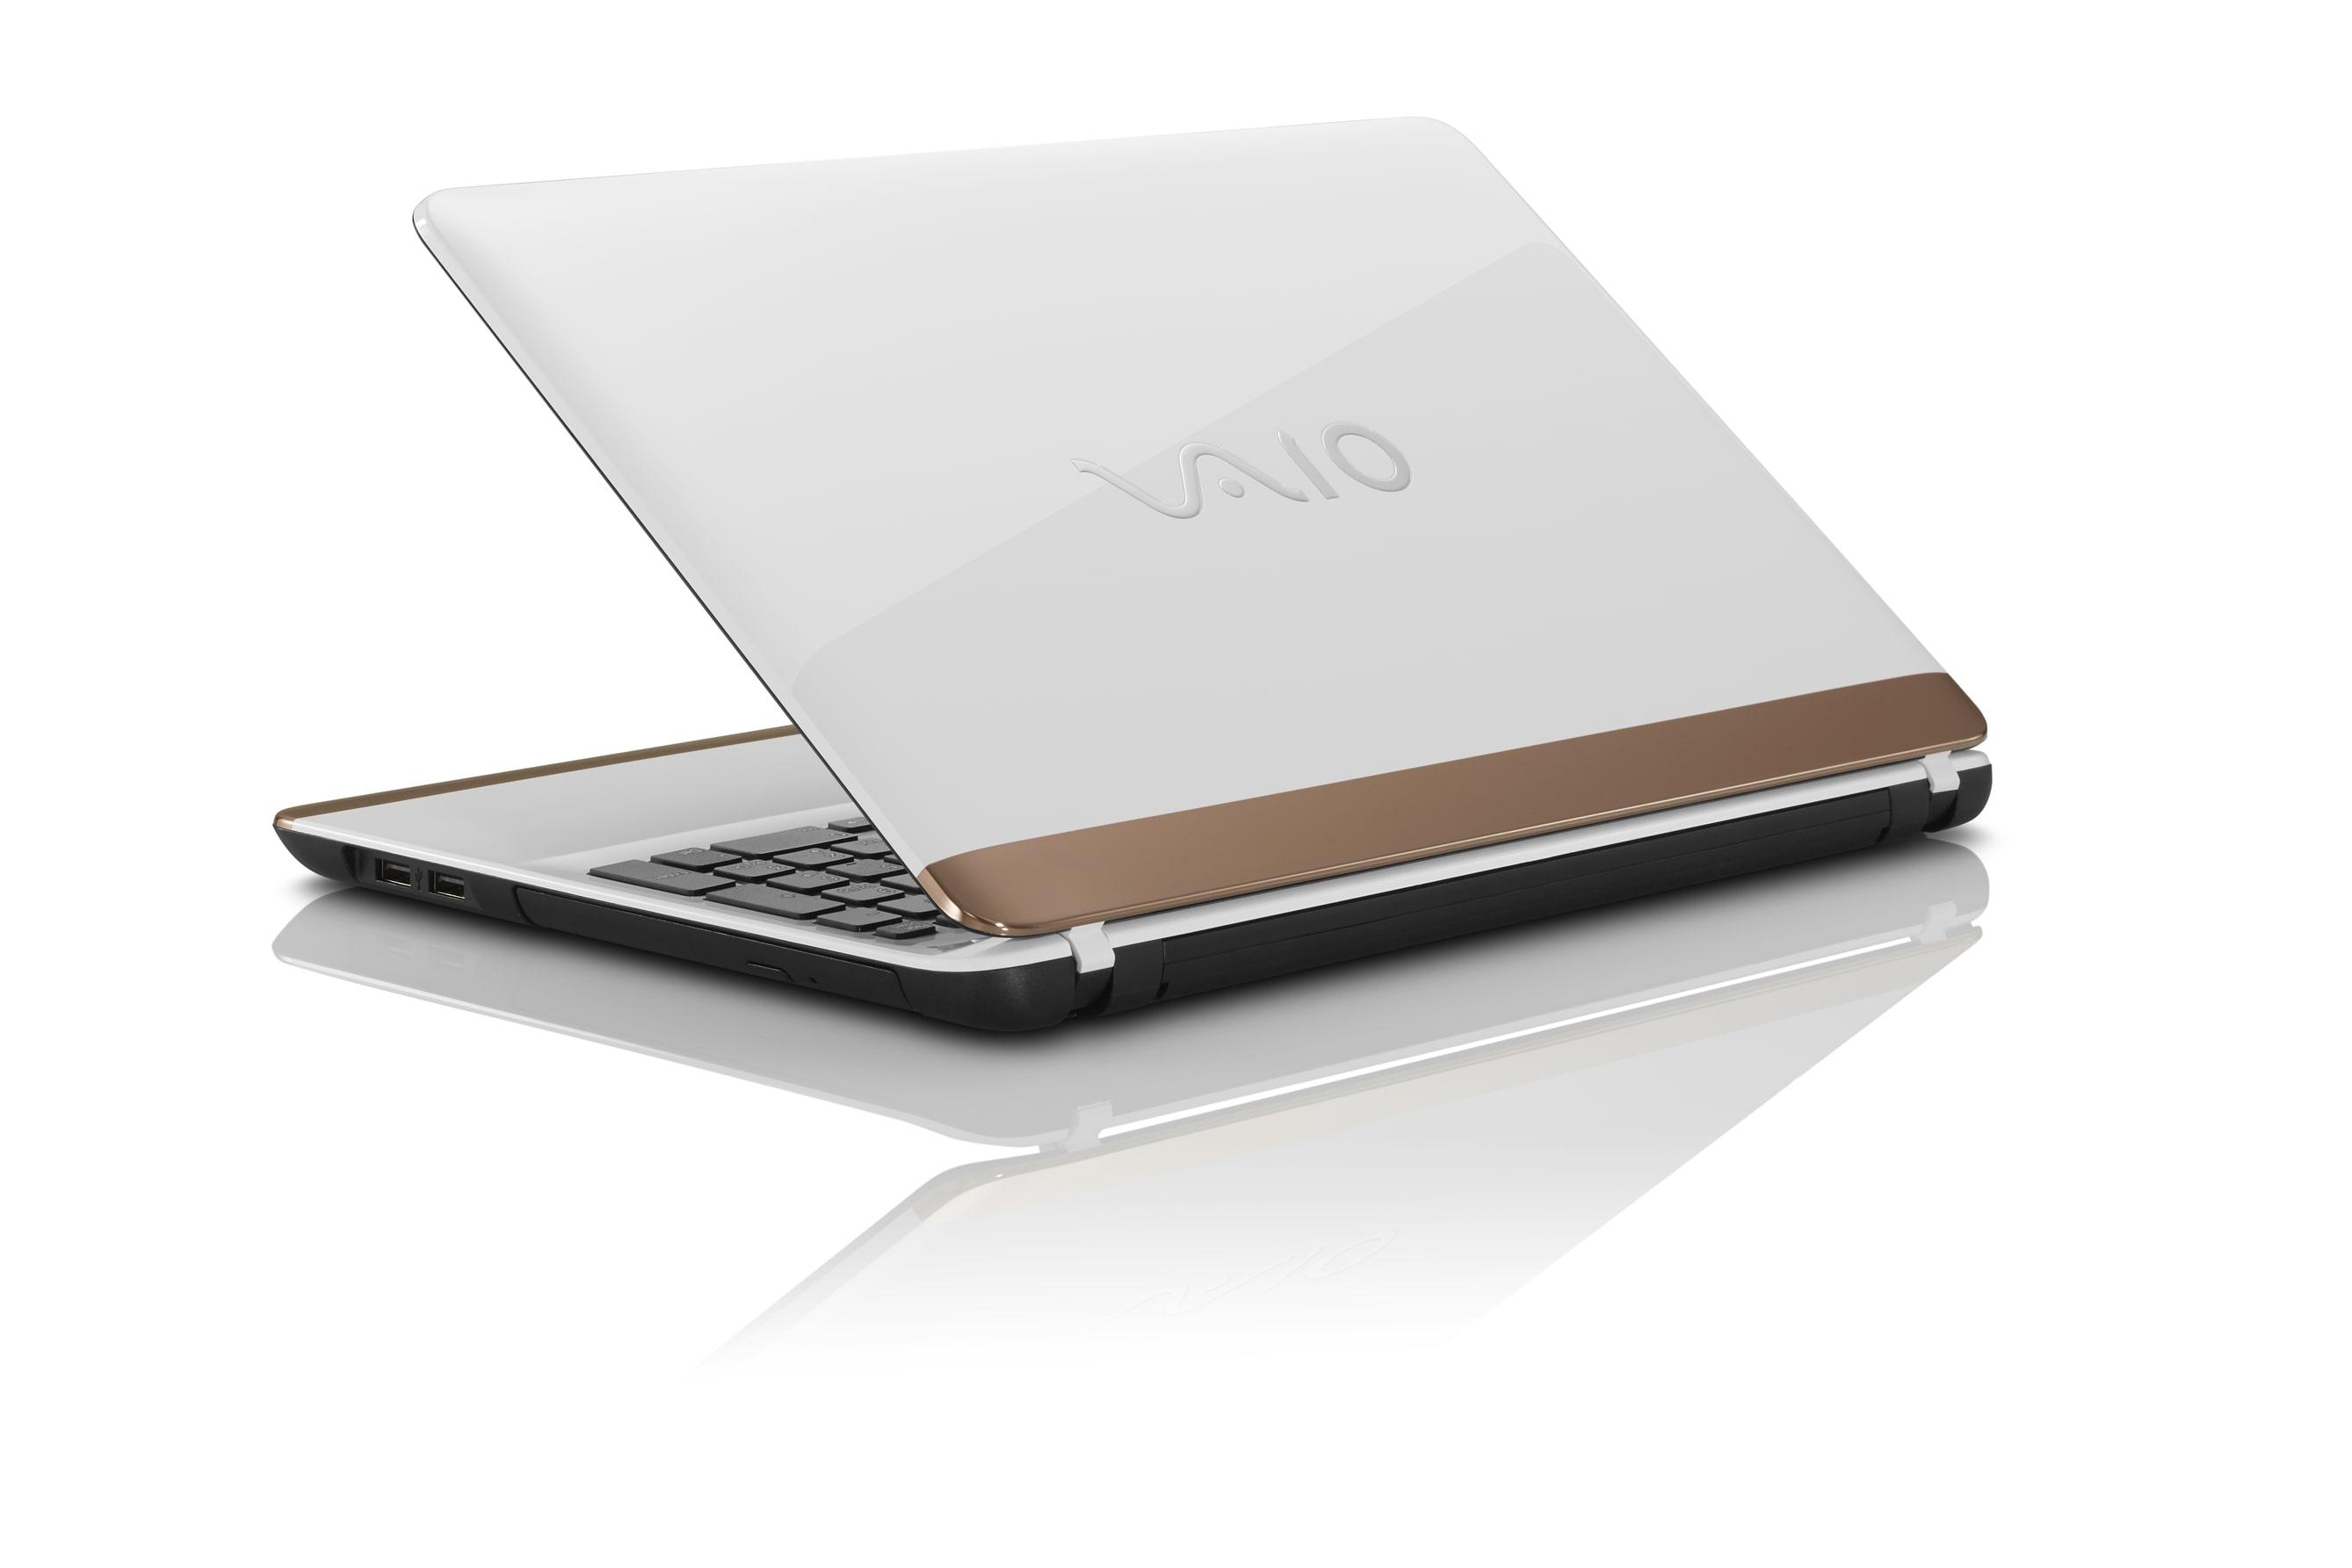 VJC1518(アウトレット新品 1年保証)販売終了